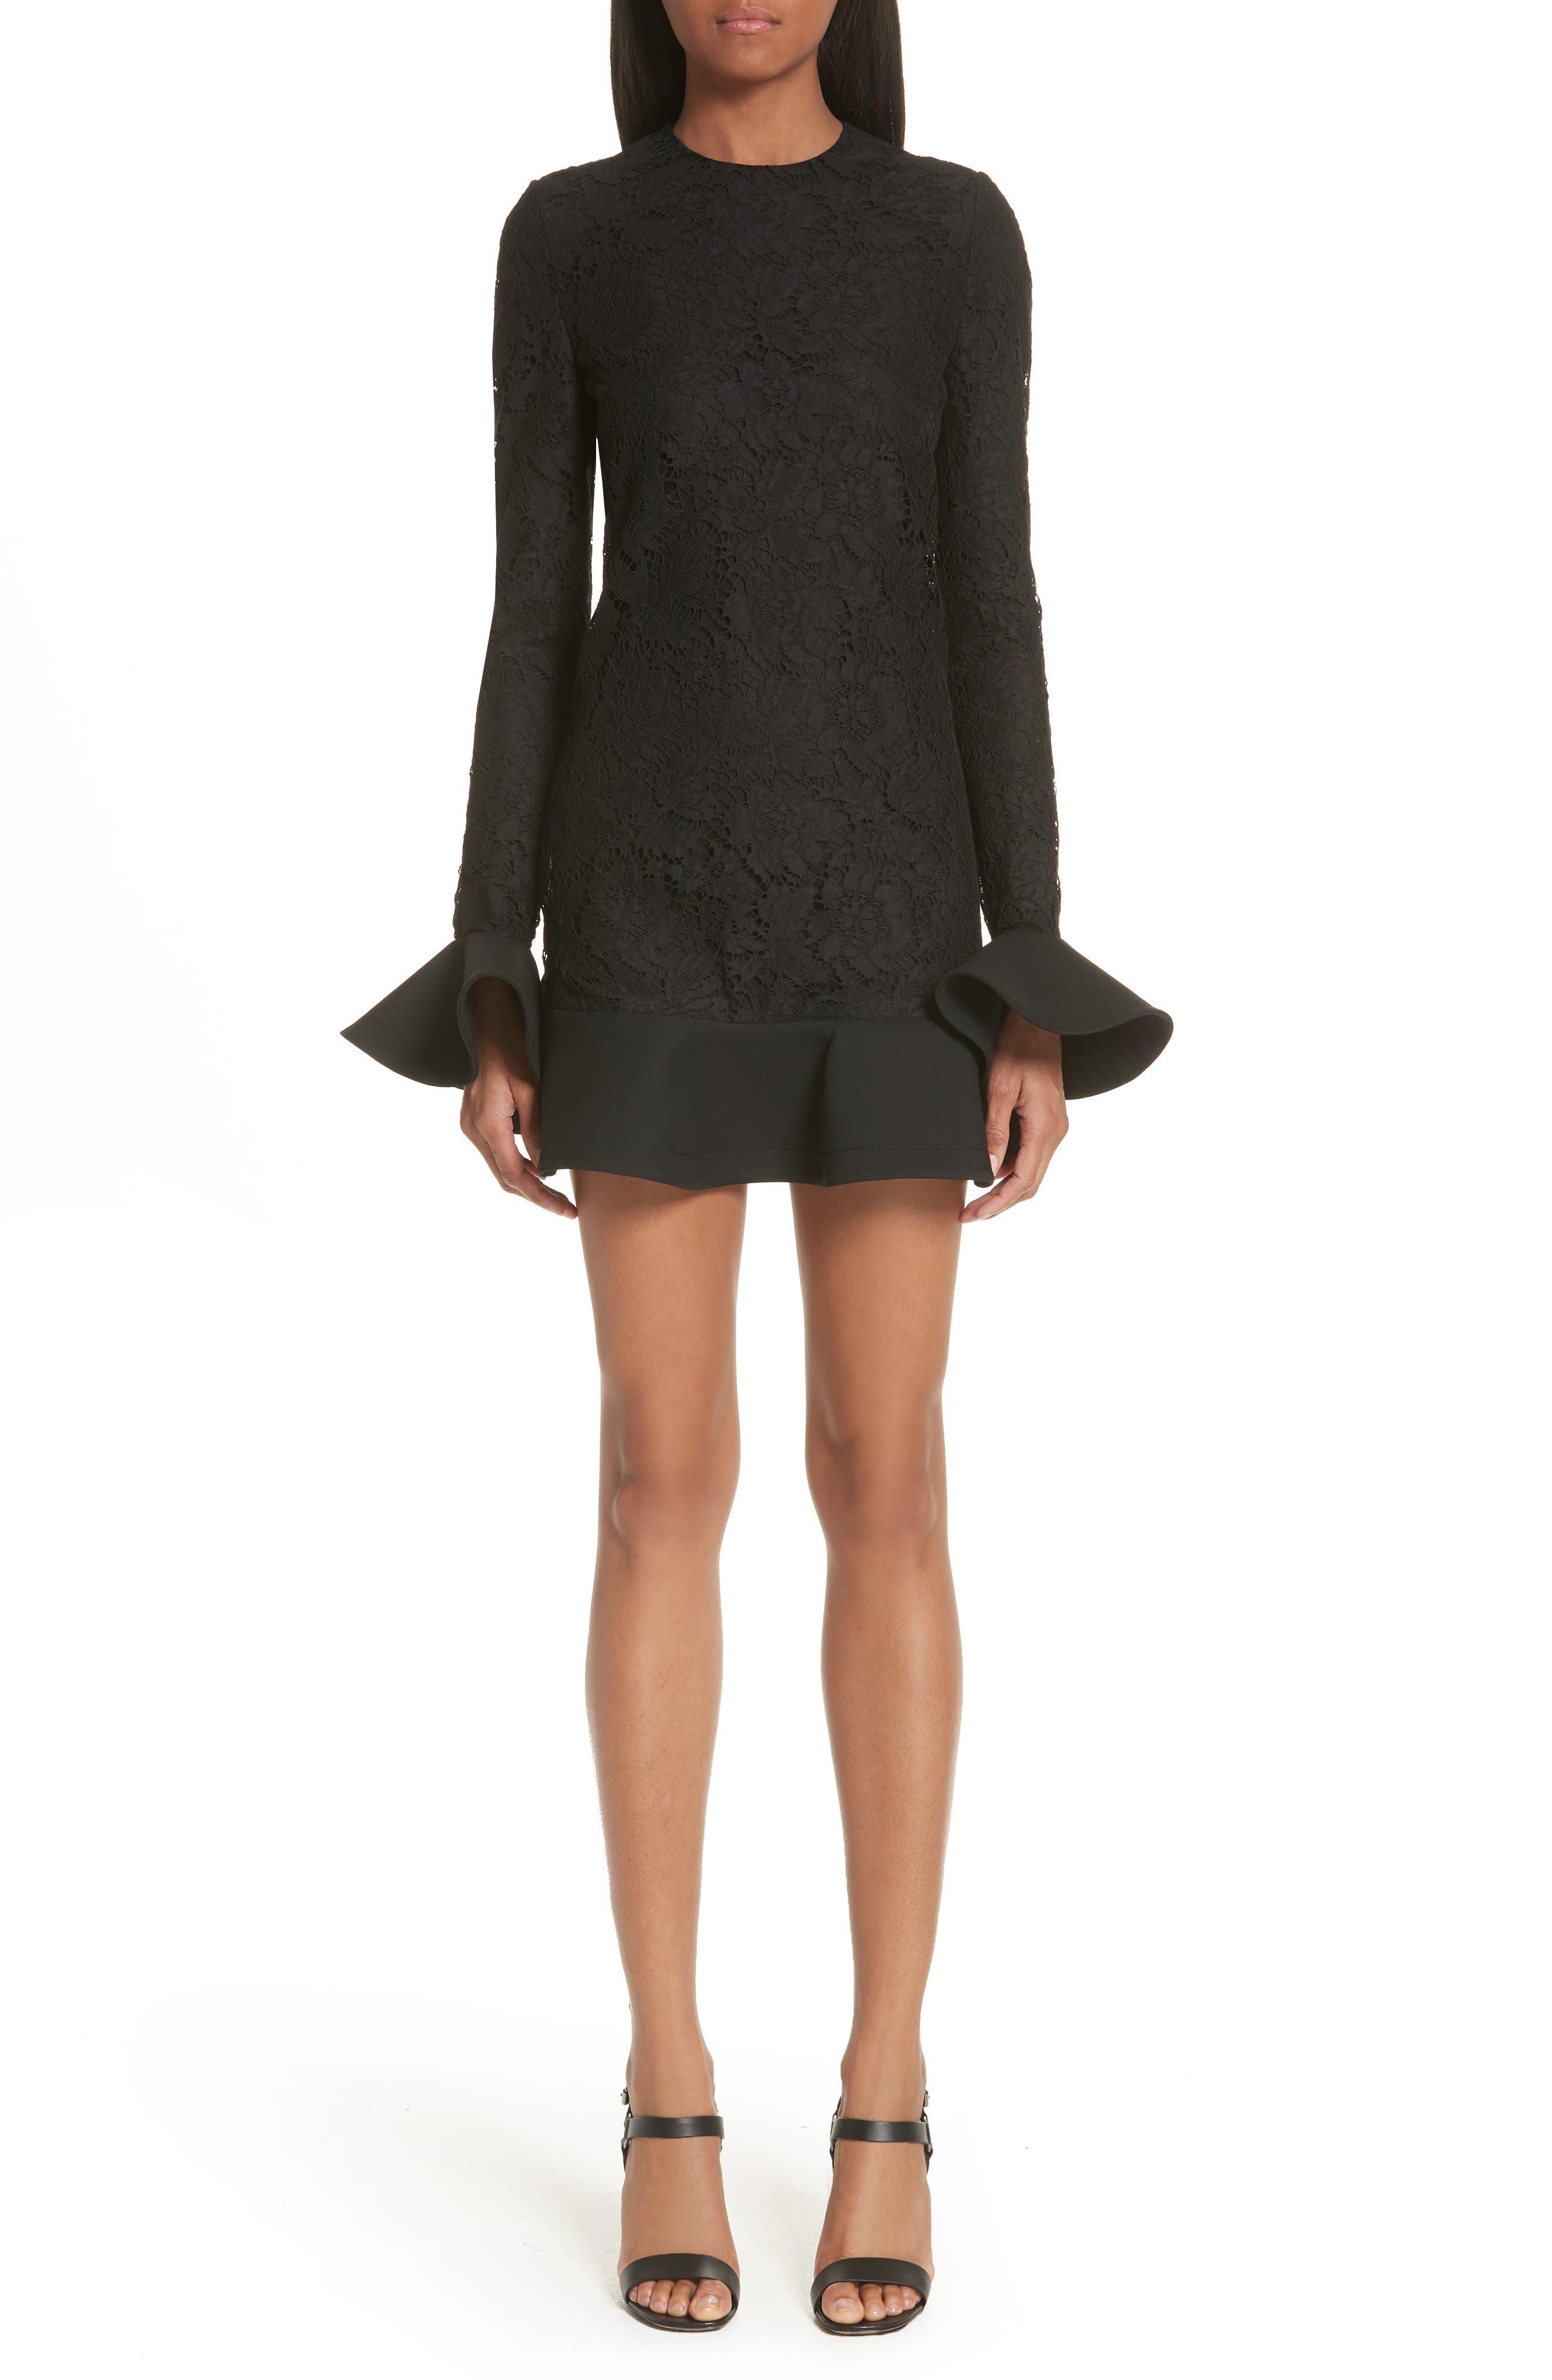 VALENTINO, Ruffle Hem Lace Dress, Main thumbnail 1, color, BLACK